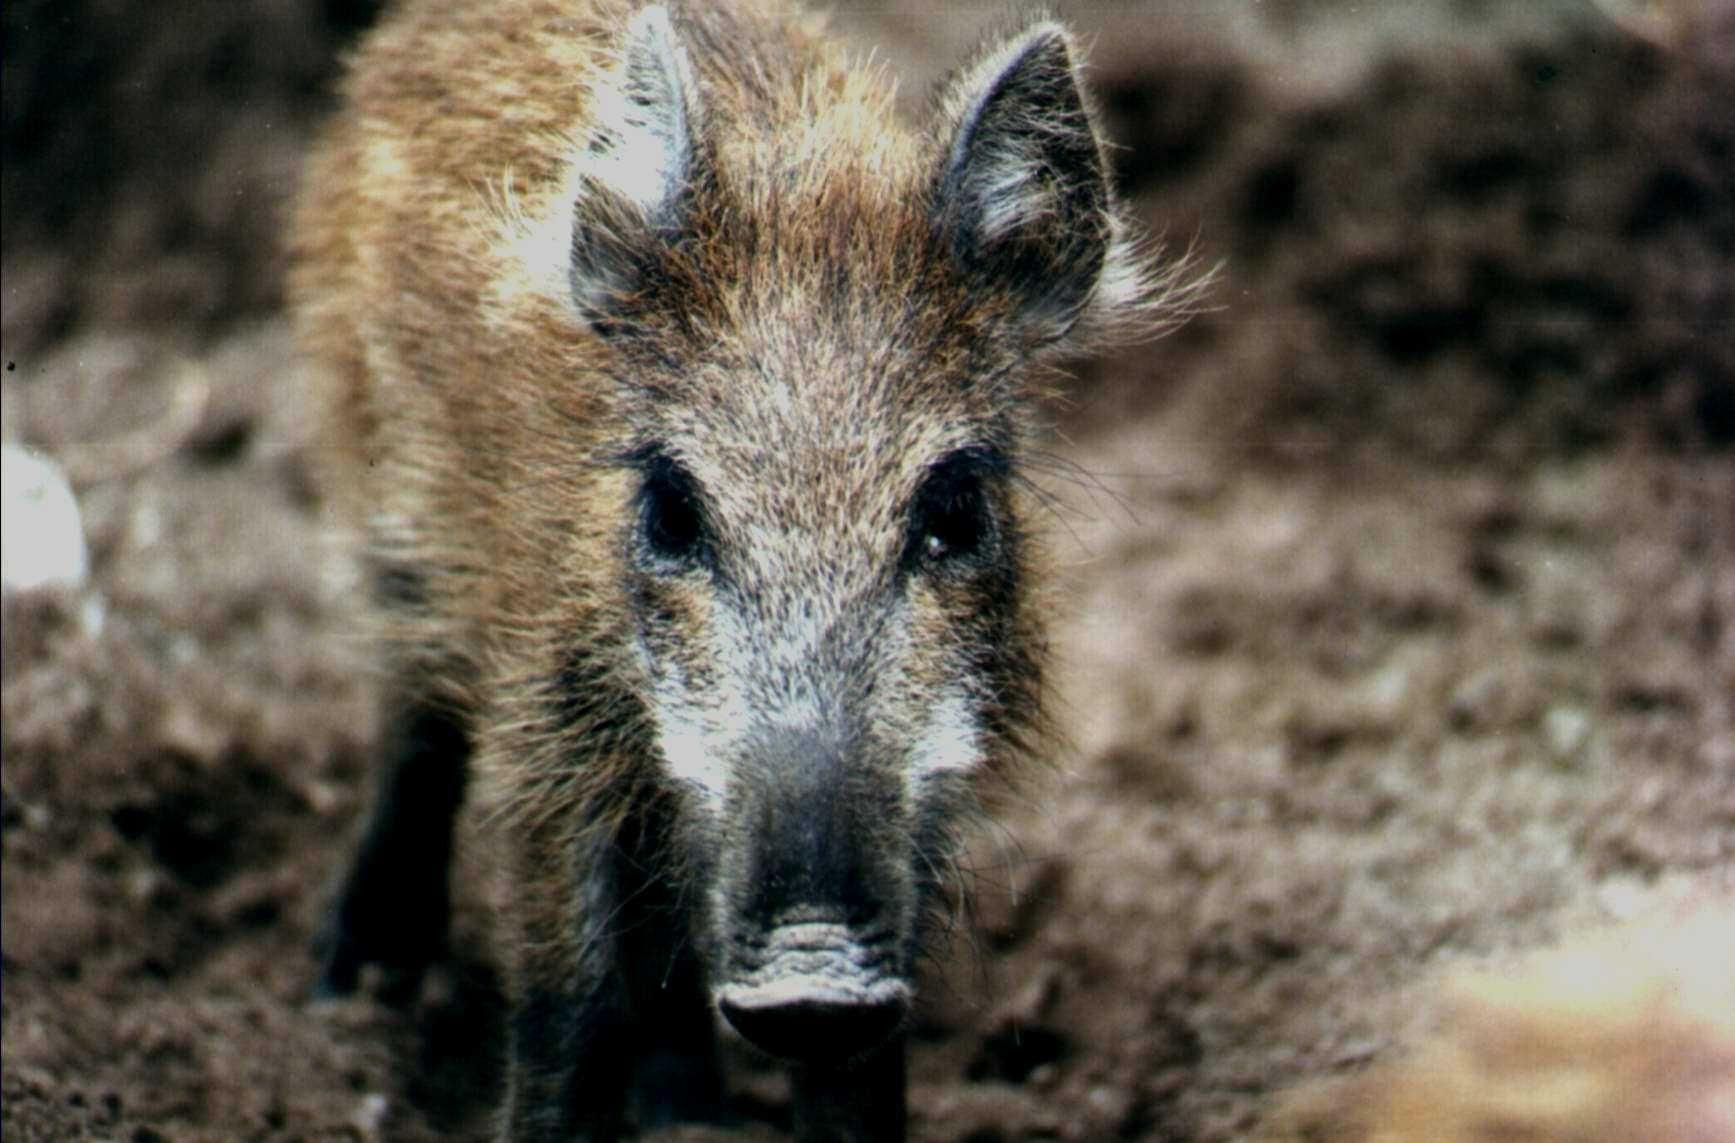 Argentina+Fauna   ... Argentina no está adecuadamente legislada e implementada., tarea que